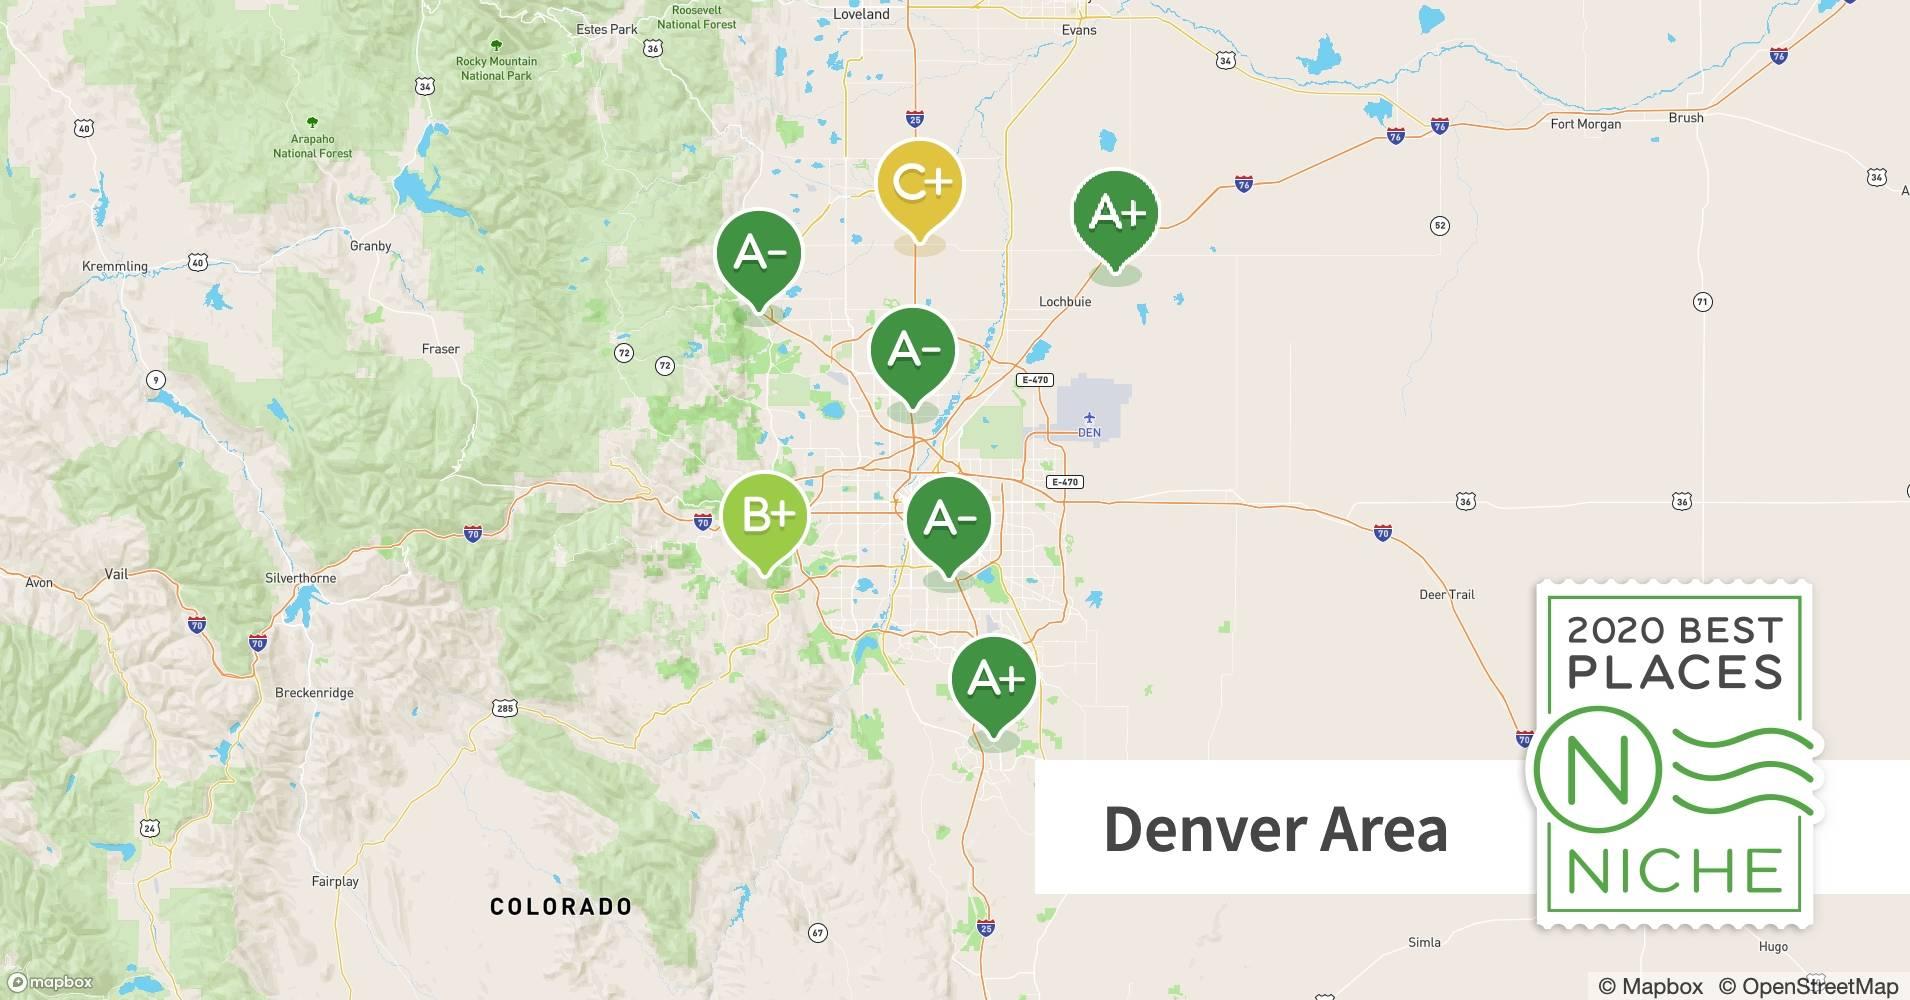 2020 Best Denver Area Suburbs To Live Niche